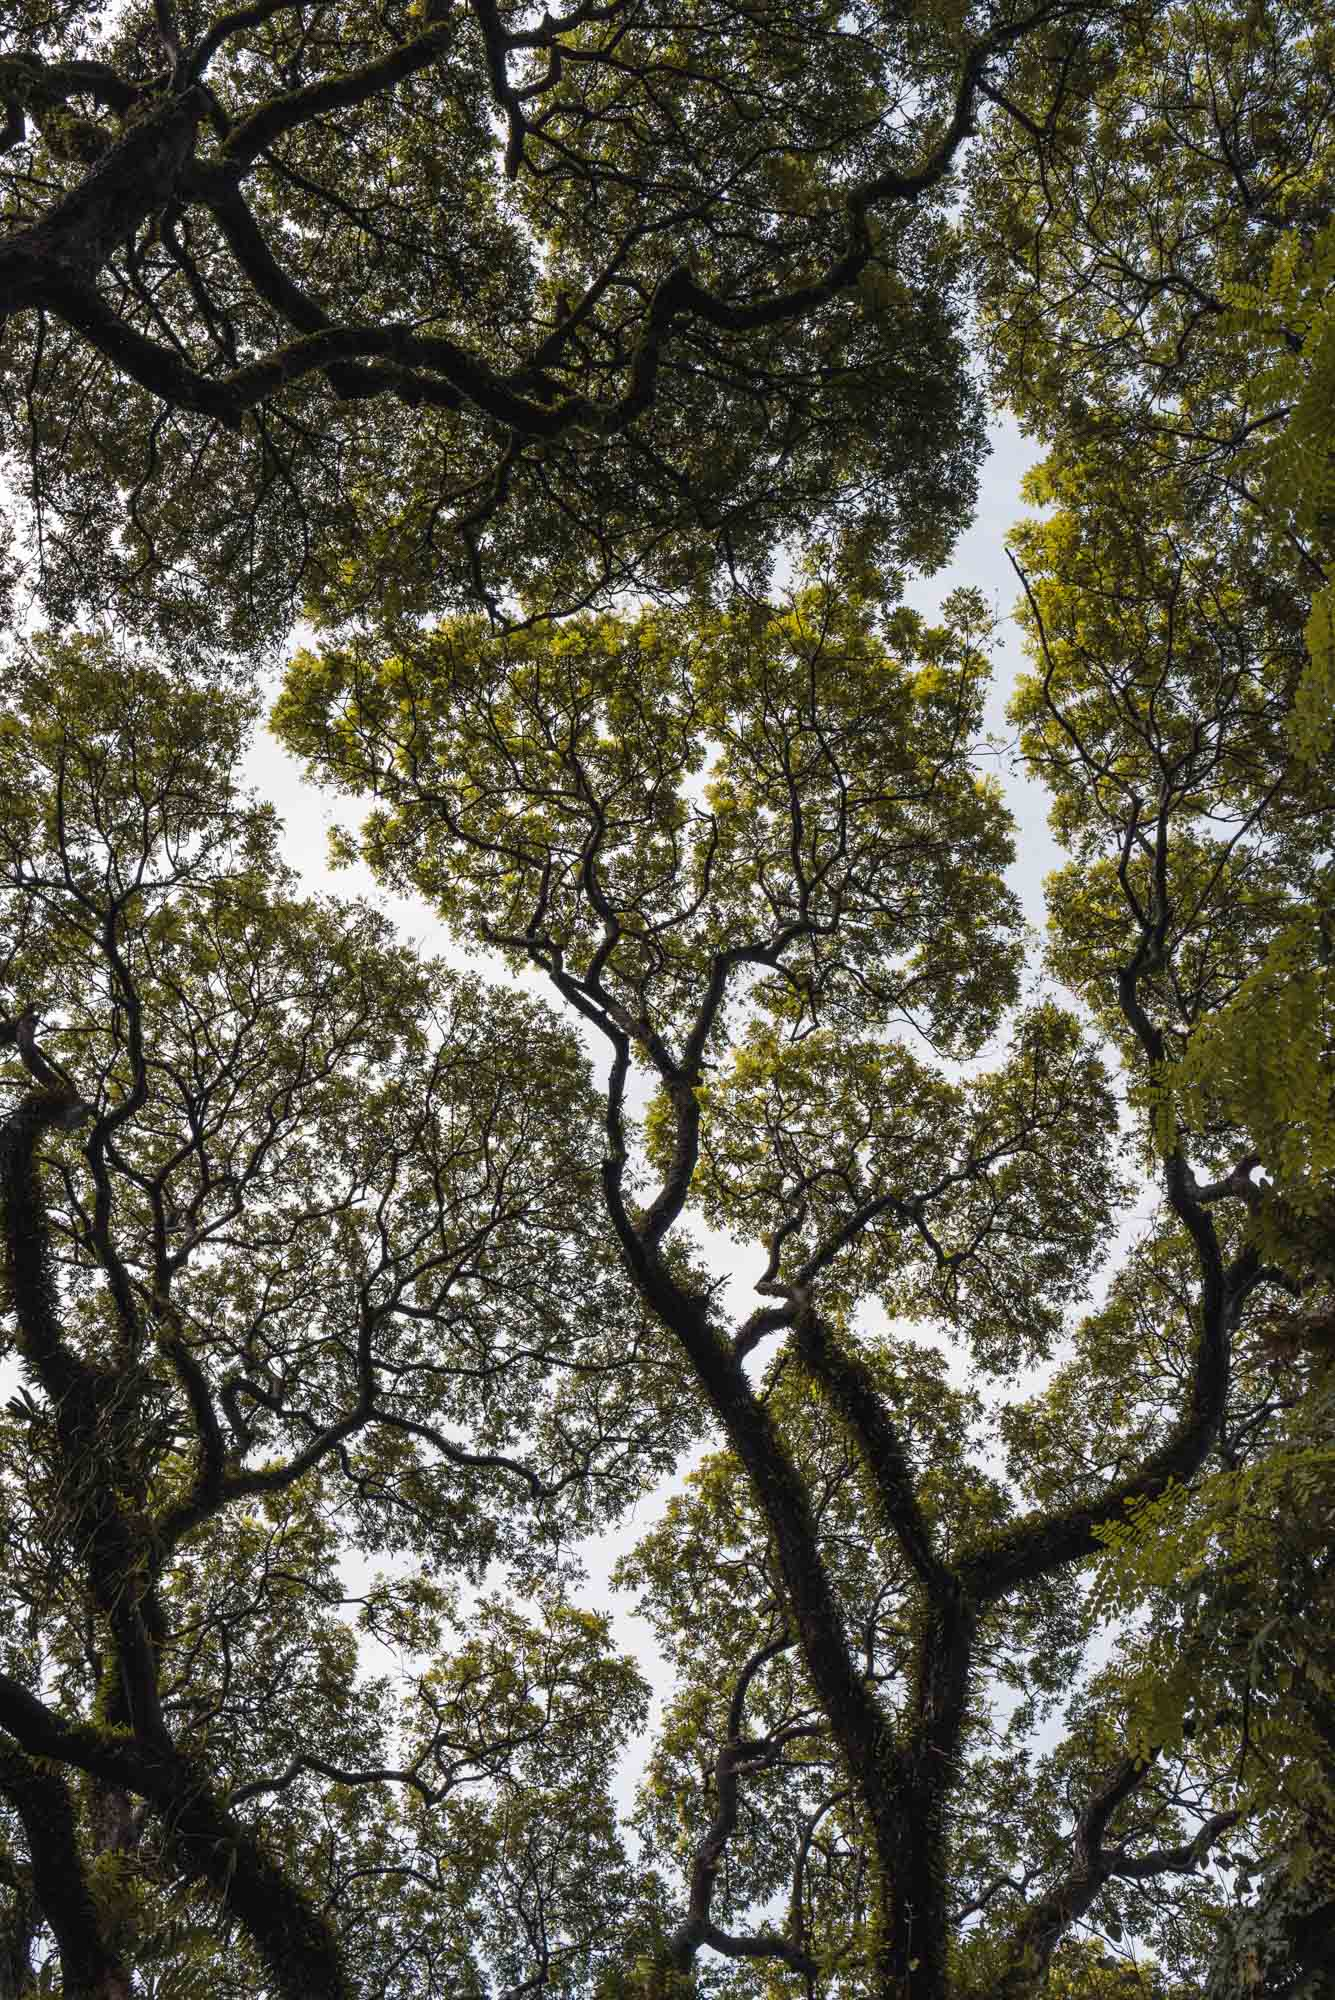 Tree canopy in Fort Kochi